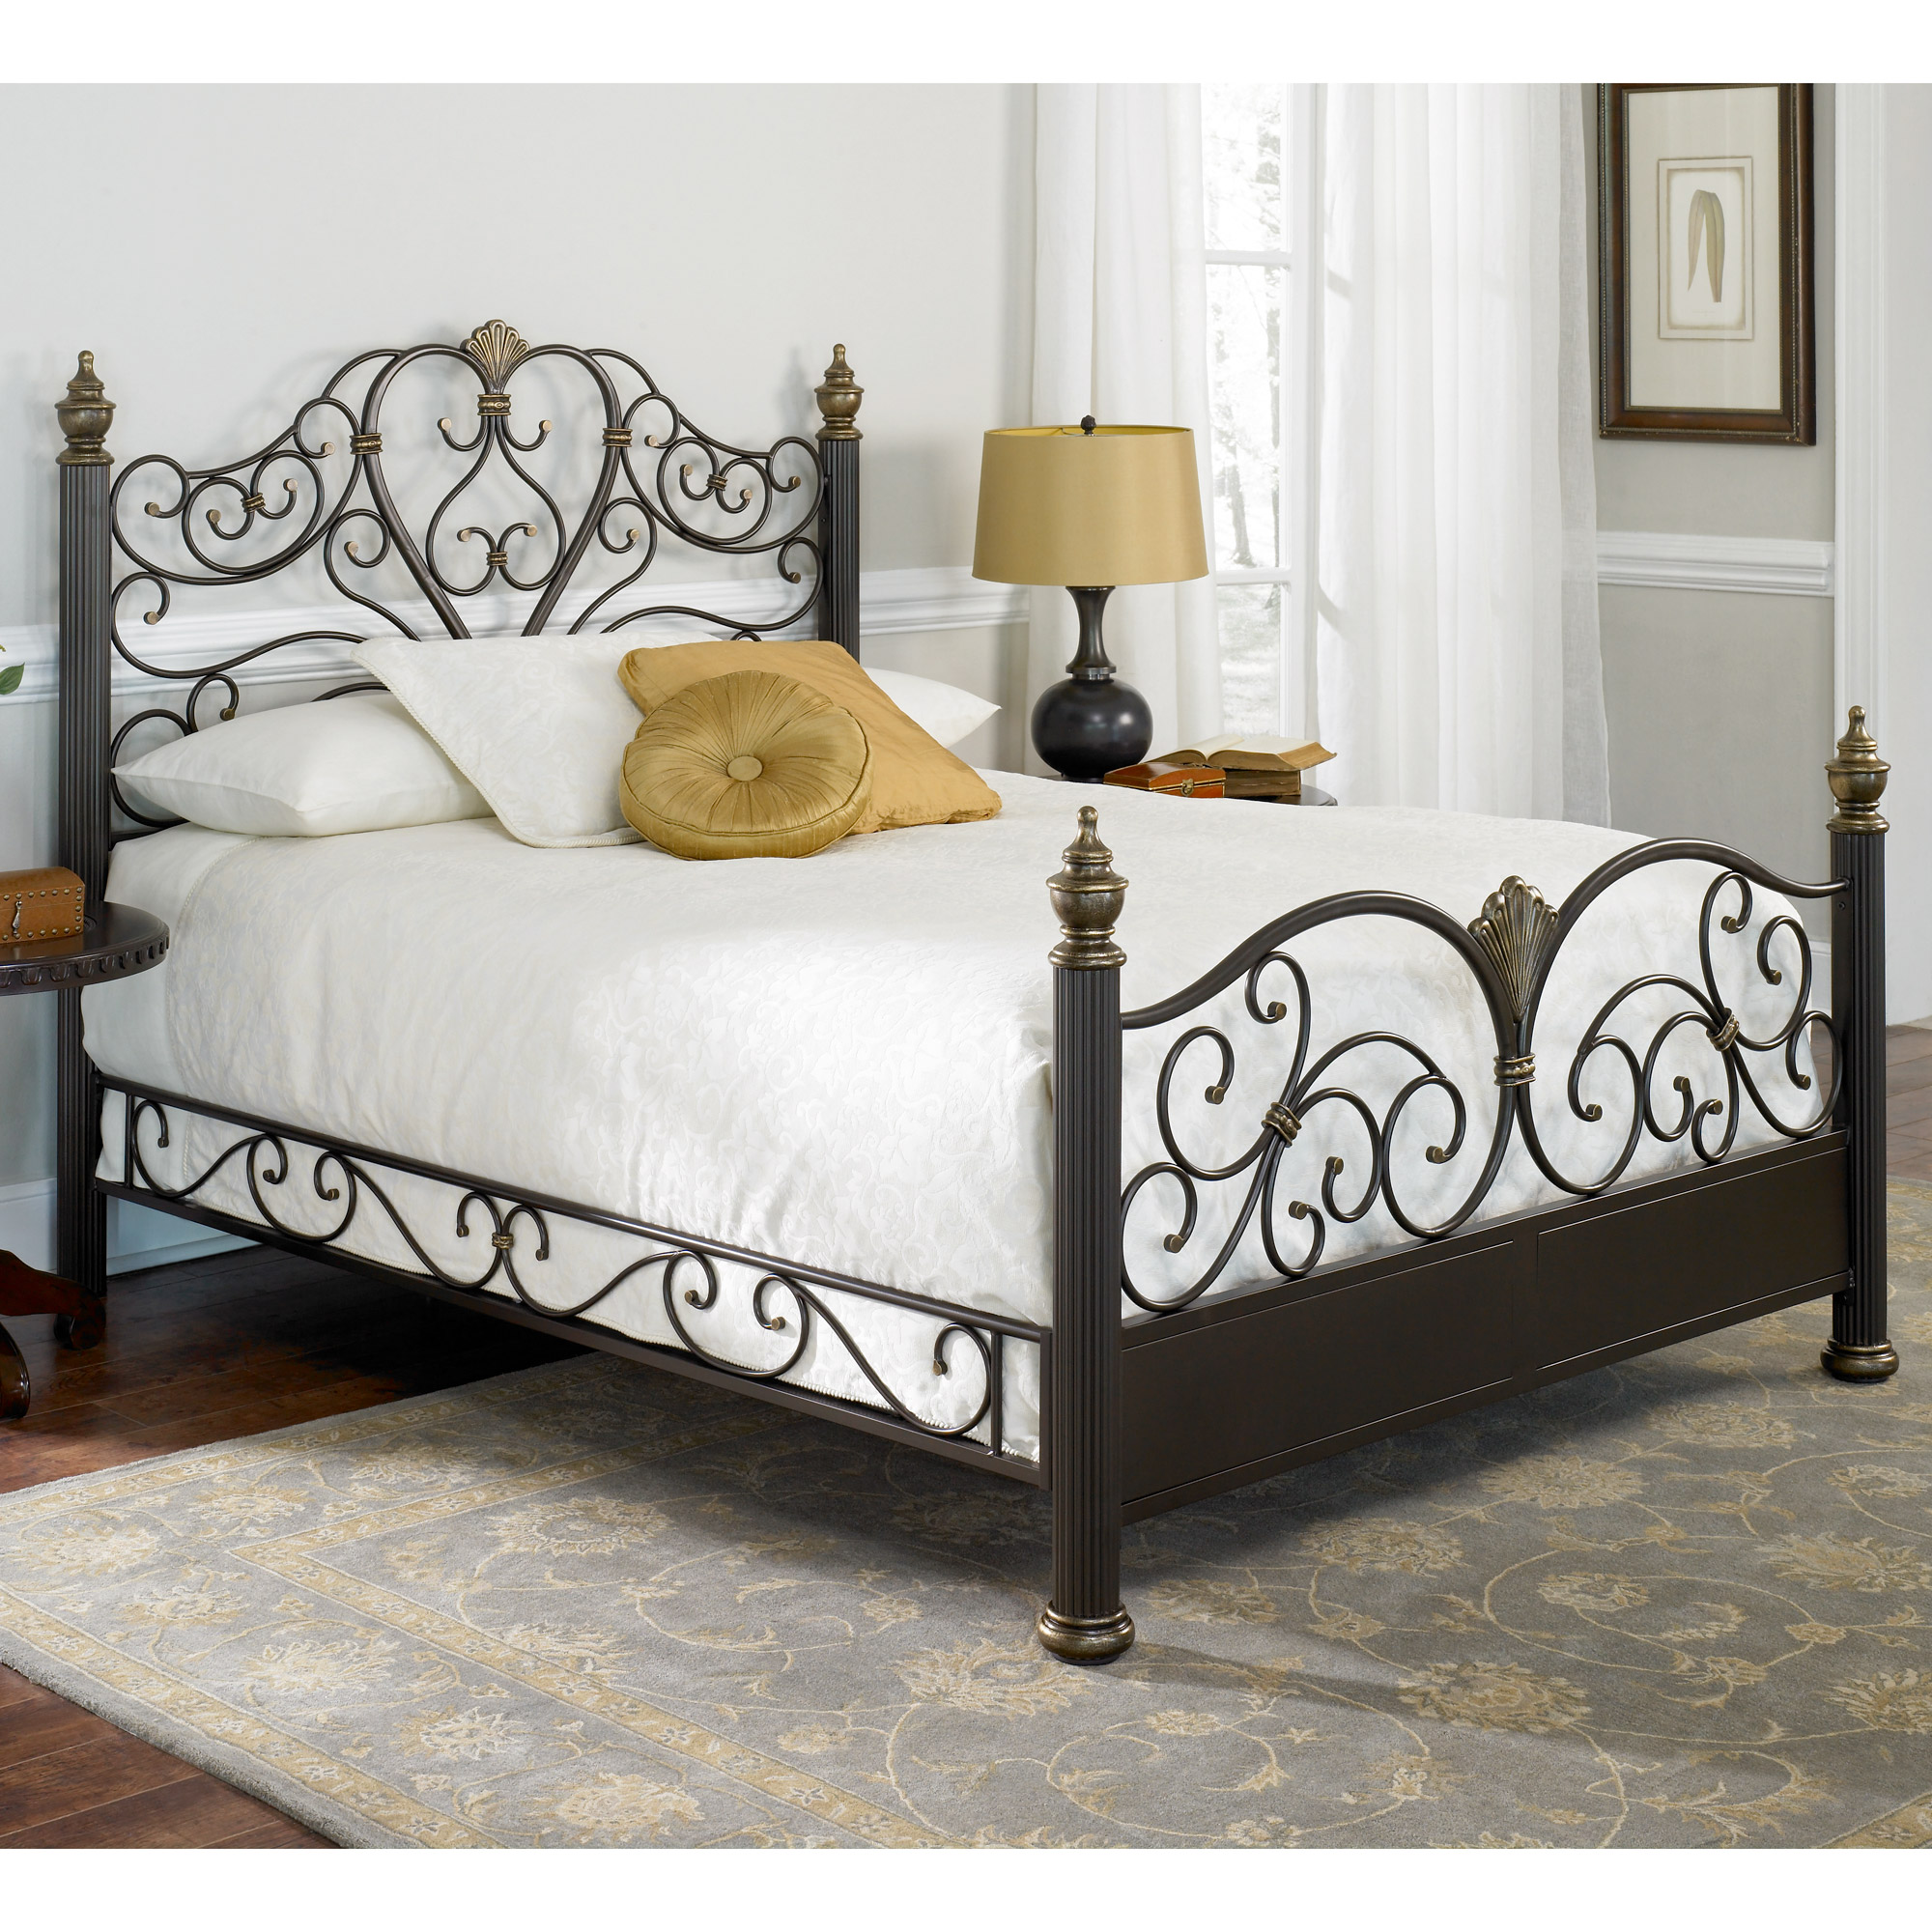 iron beds elegance iron bed ornate victorian design glided truffle finish HXWNLXW